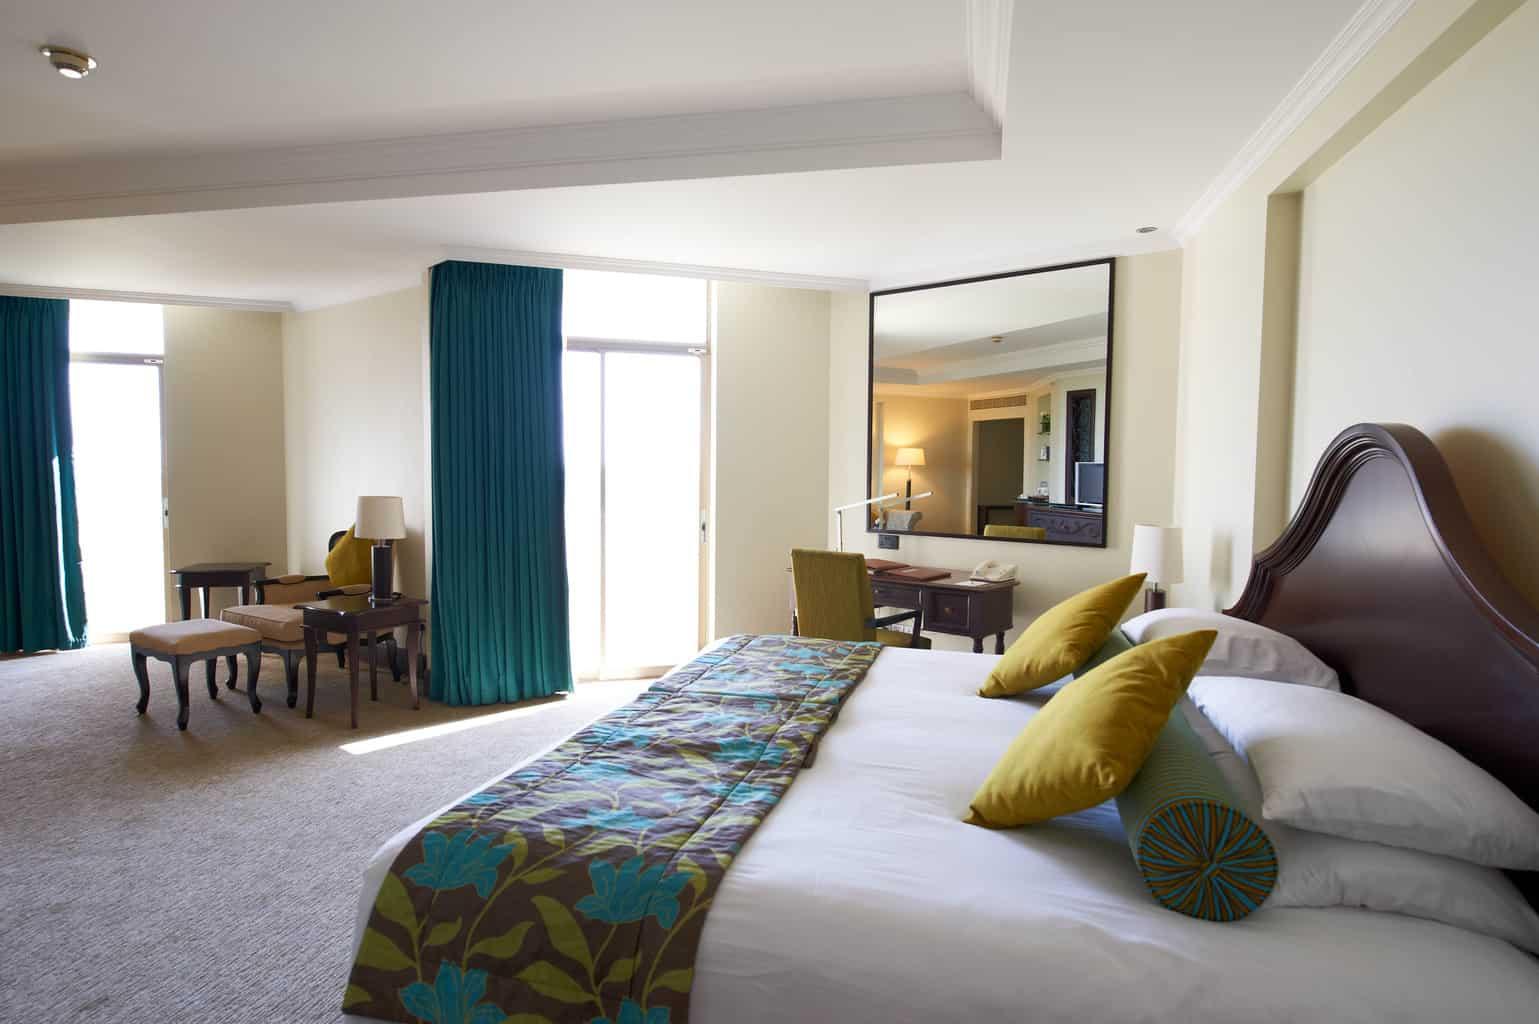 Garden View Room Accommodation at Ja Beach Hotel mirror